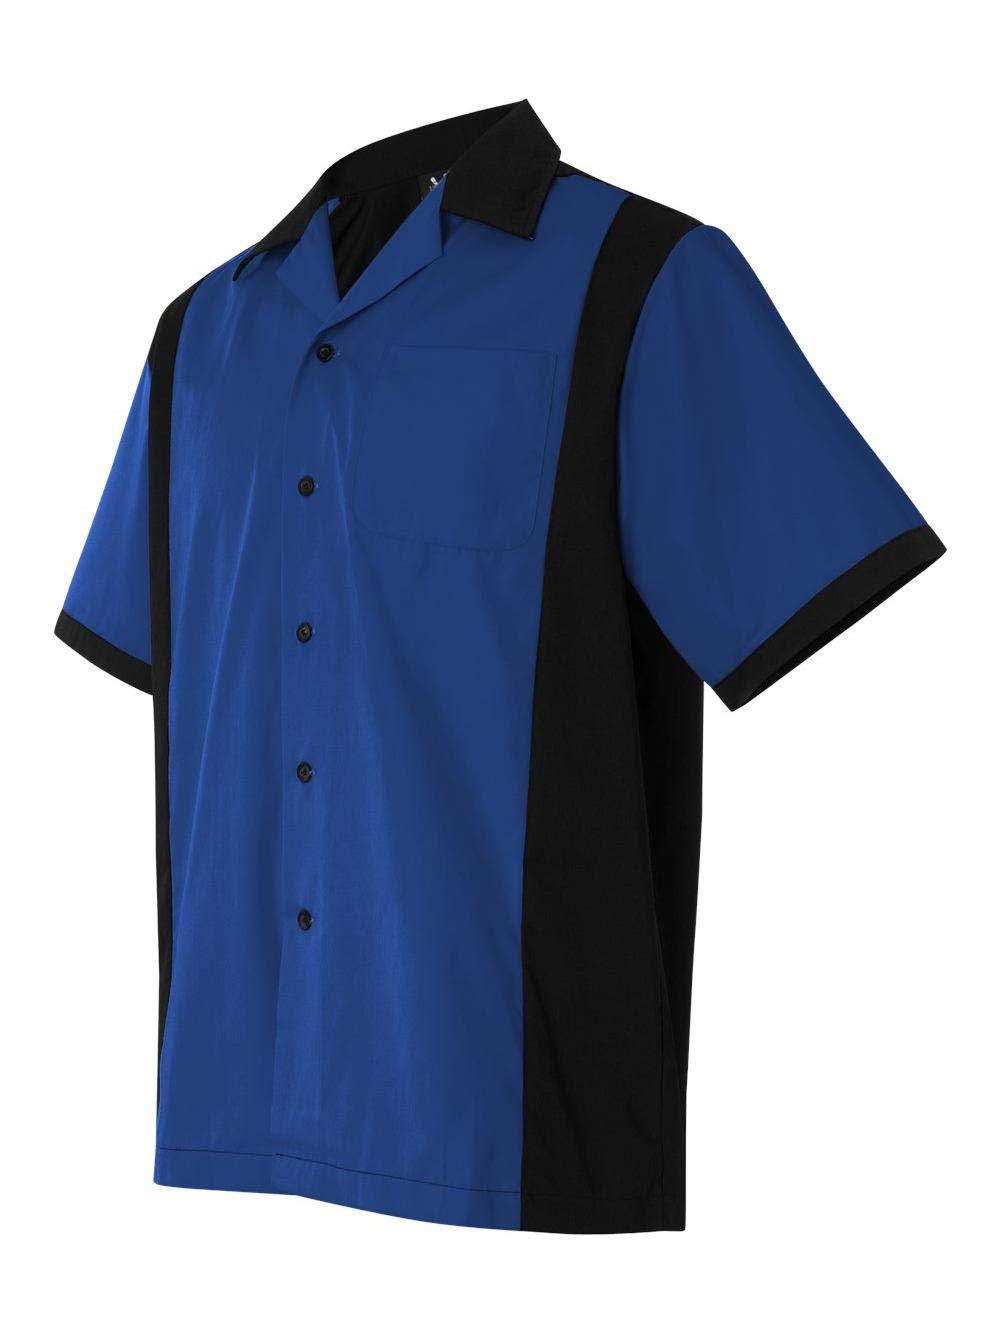 Hilton - Cruiser Bowling Shirt - HP2243-3XL - Royal